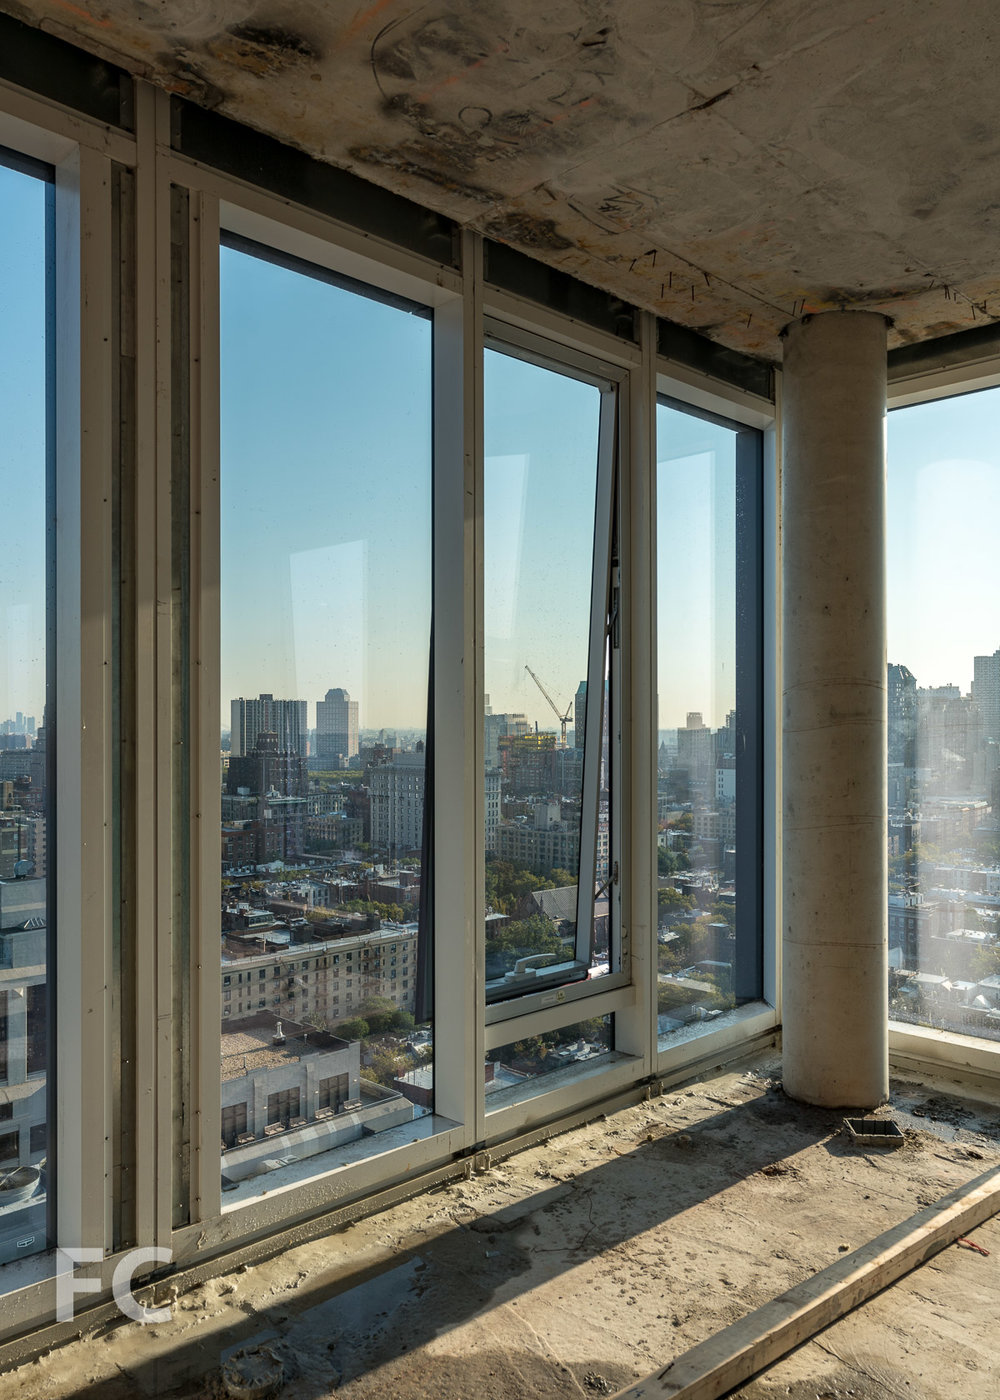 2018_10_03-Quay Tower-DSC07977.jpg